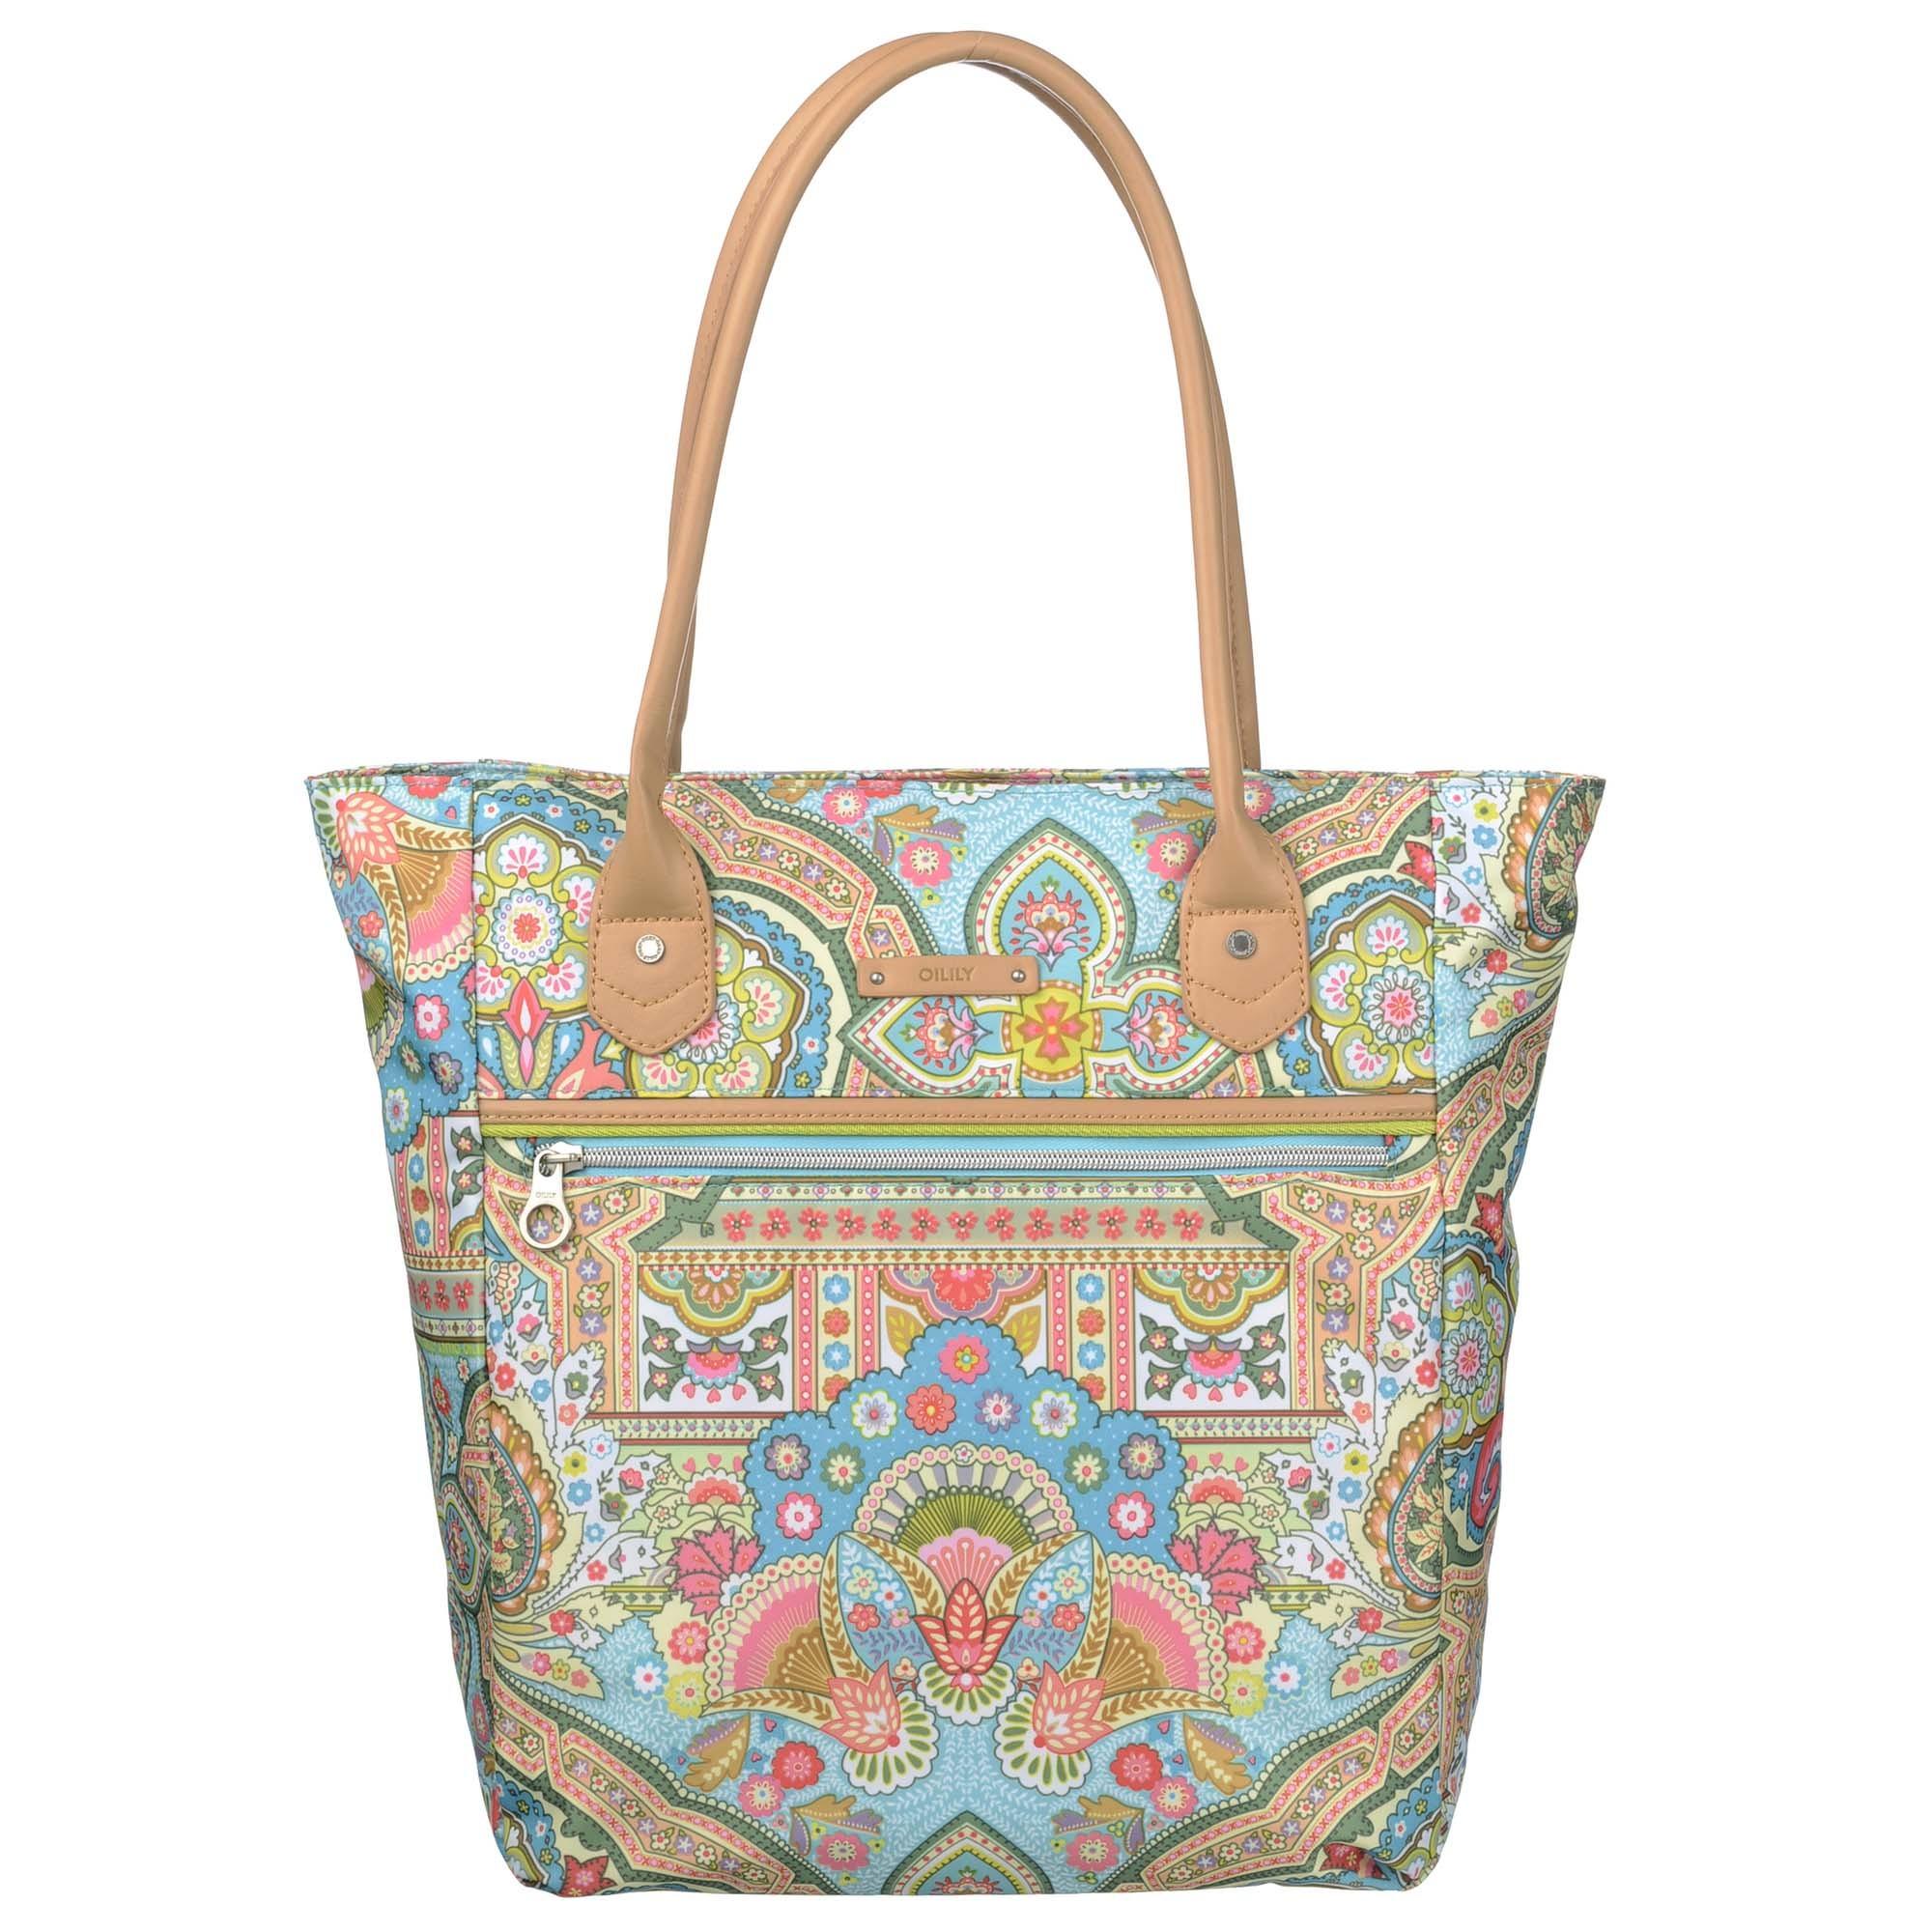 Oilily shopper handbag spring ovation in 4 colors